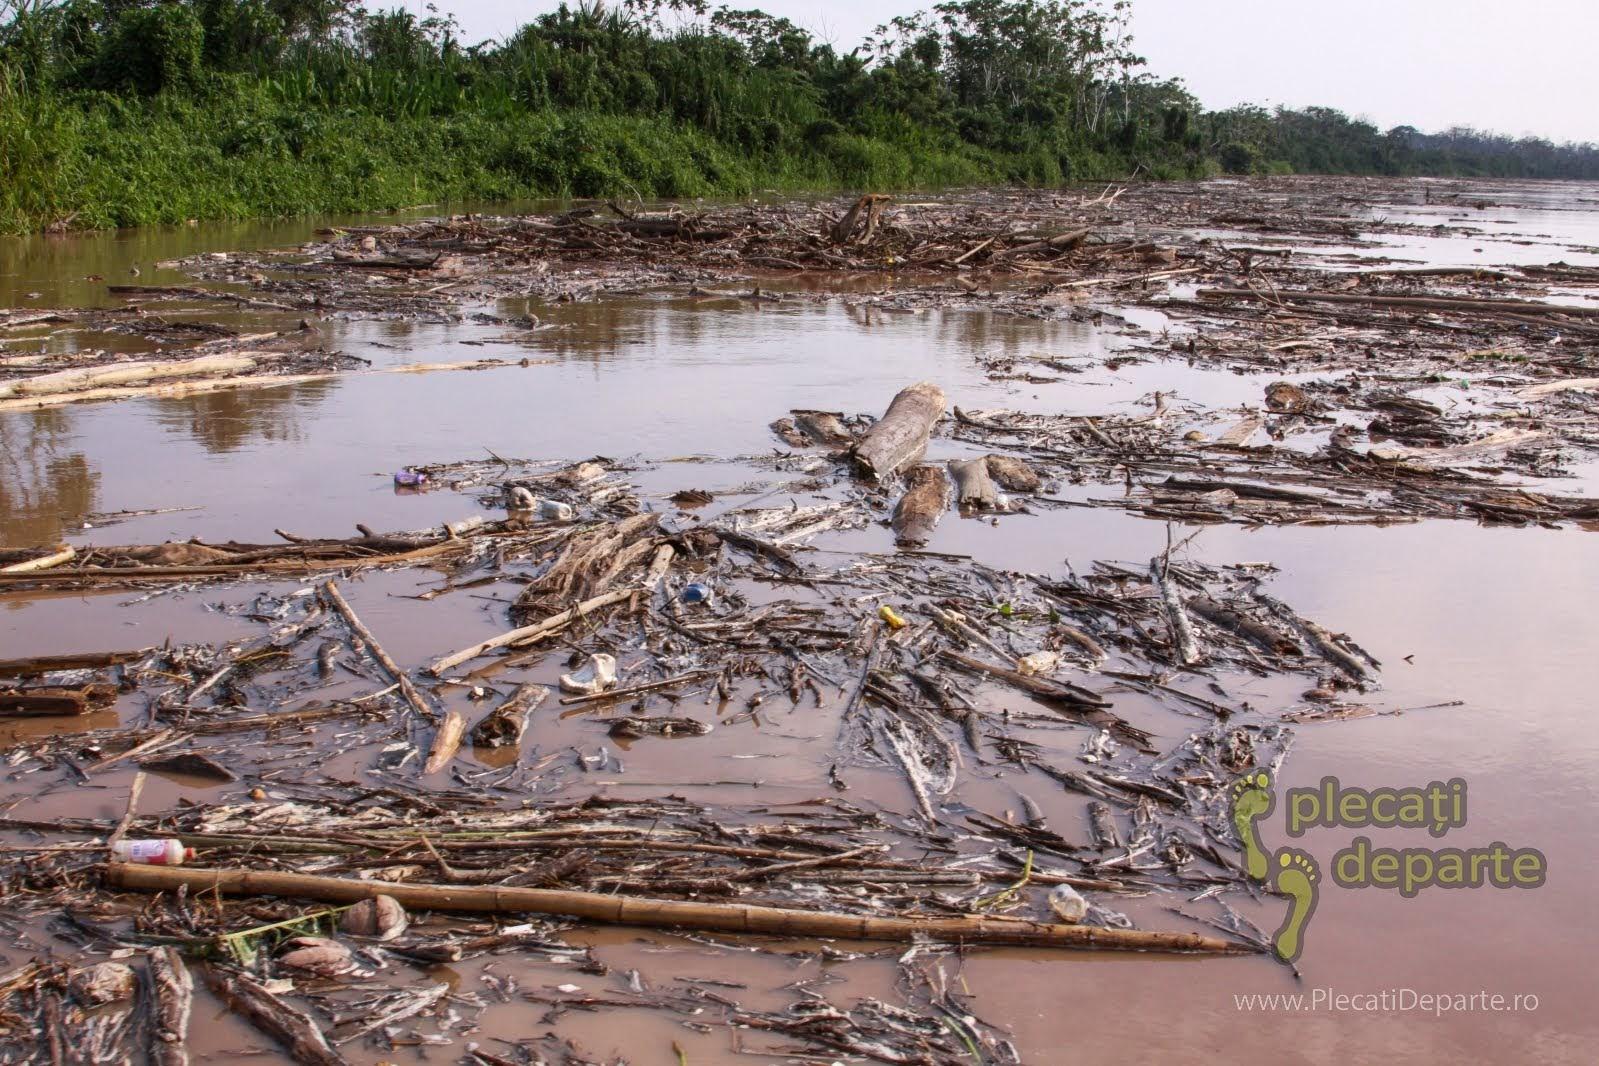 Acumulari de lemne pe raul Huallaga, afluent al fluviului Amazonian, in jungla amazoniana, in Peru